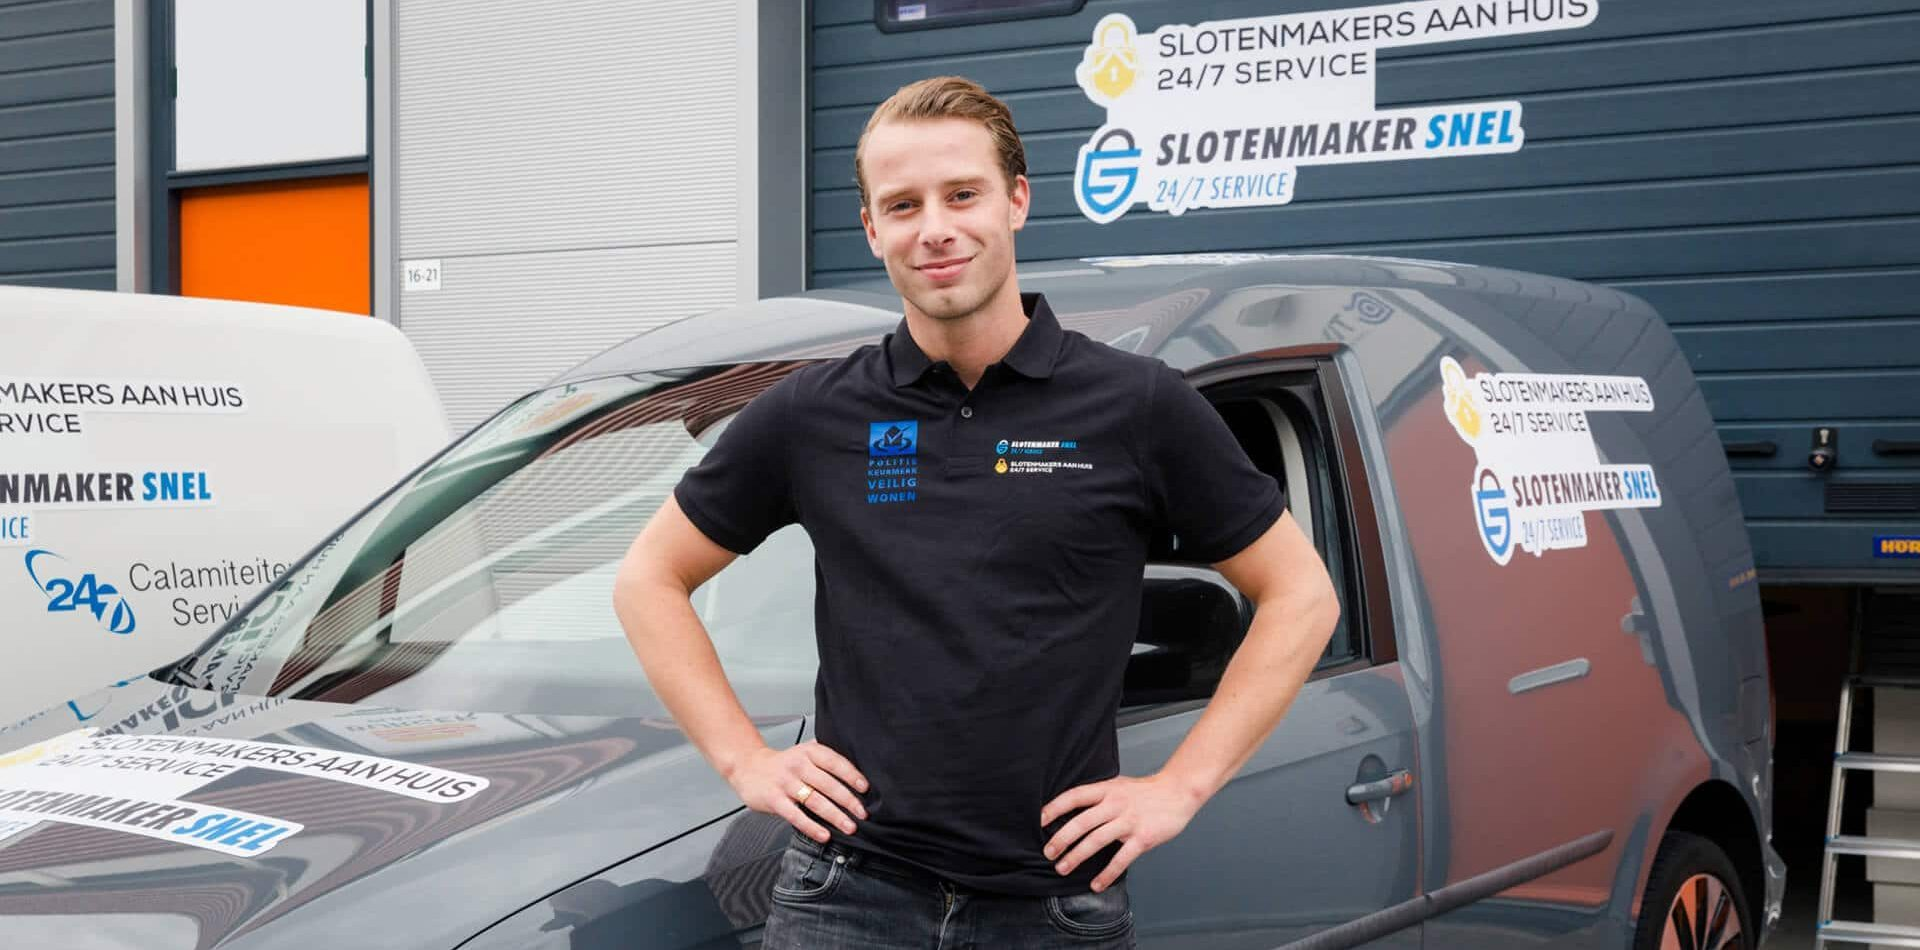 Slotenmaker Bergen op Zoom